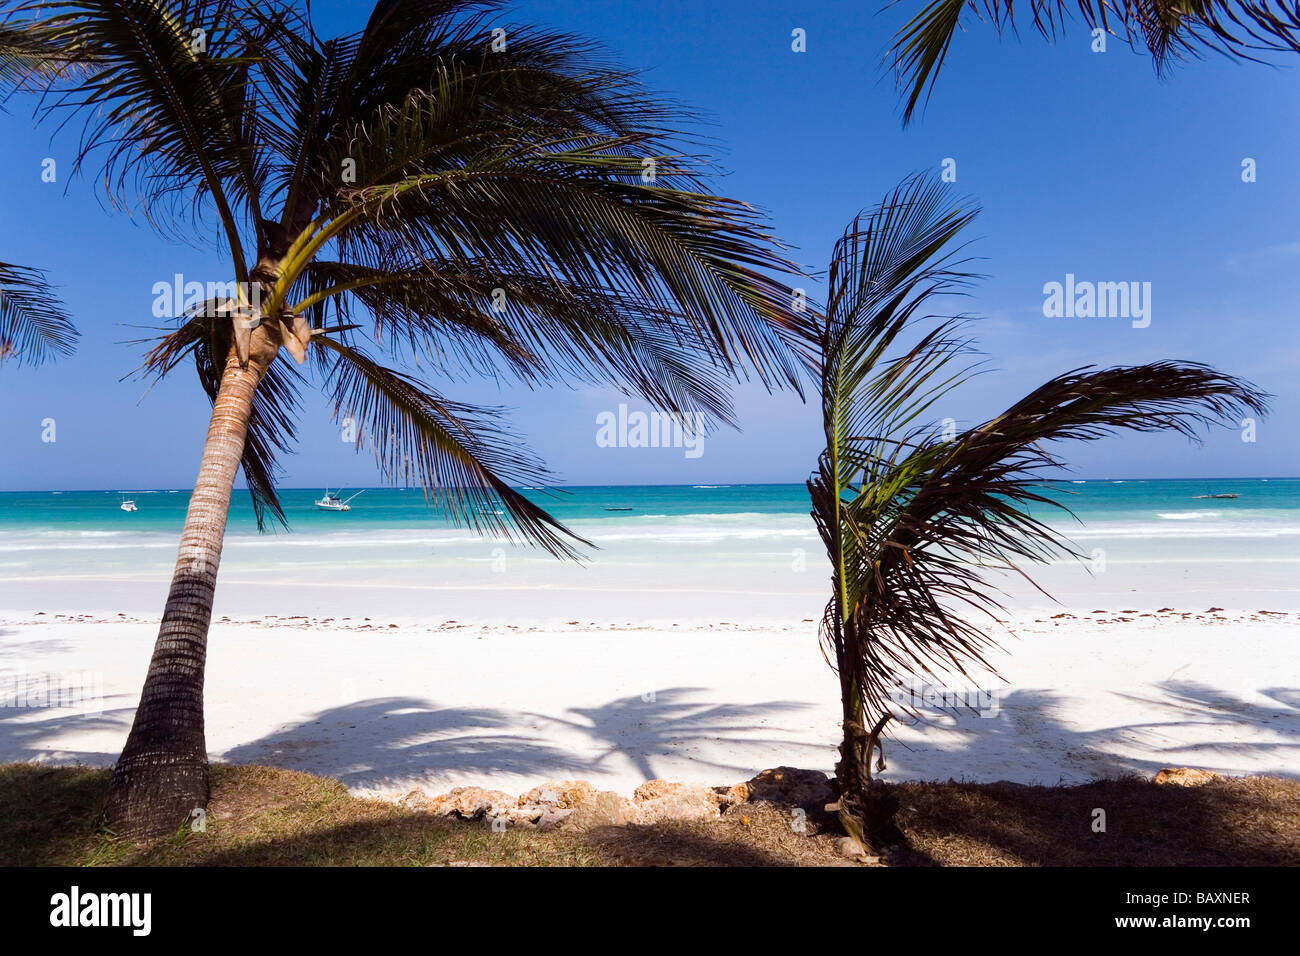 Palm trees at Diani Beach, Coast, Kenya - Stock Image